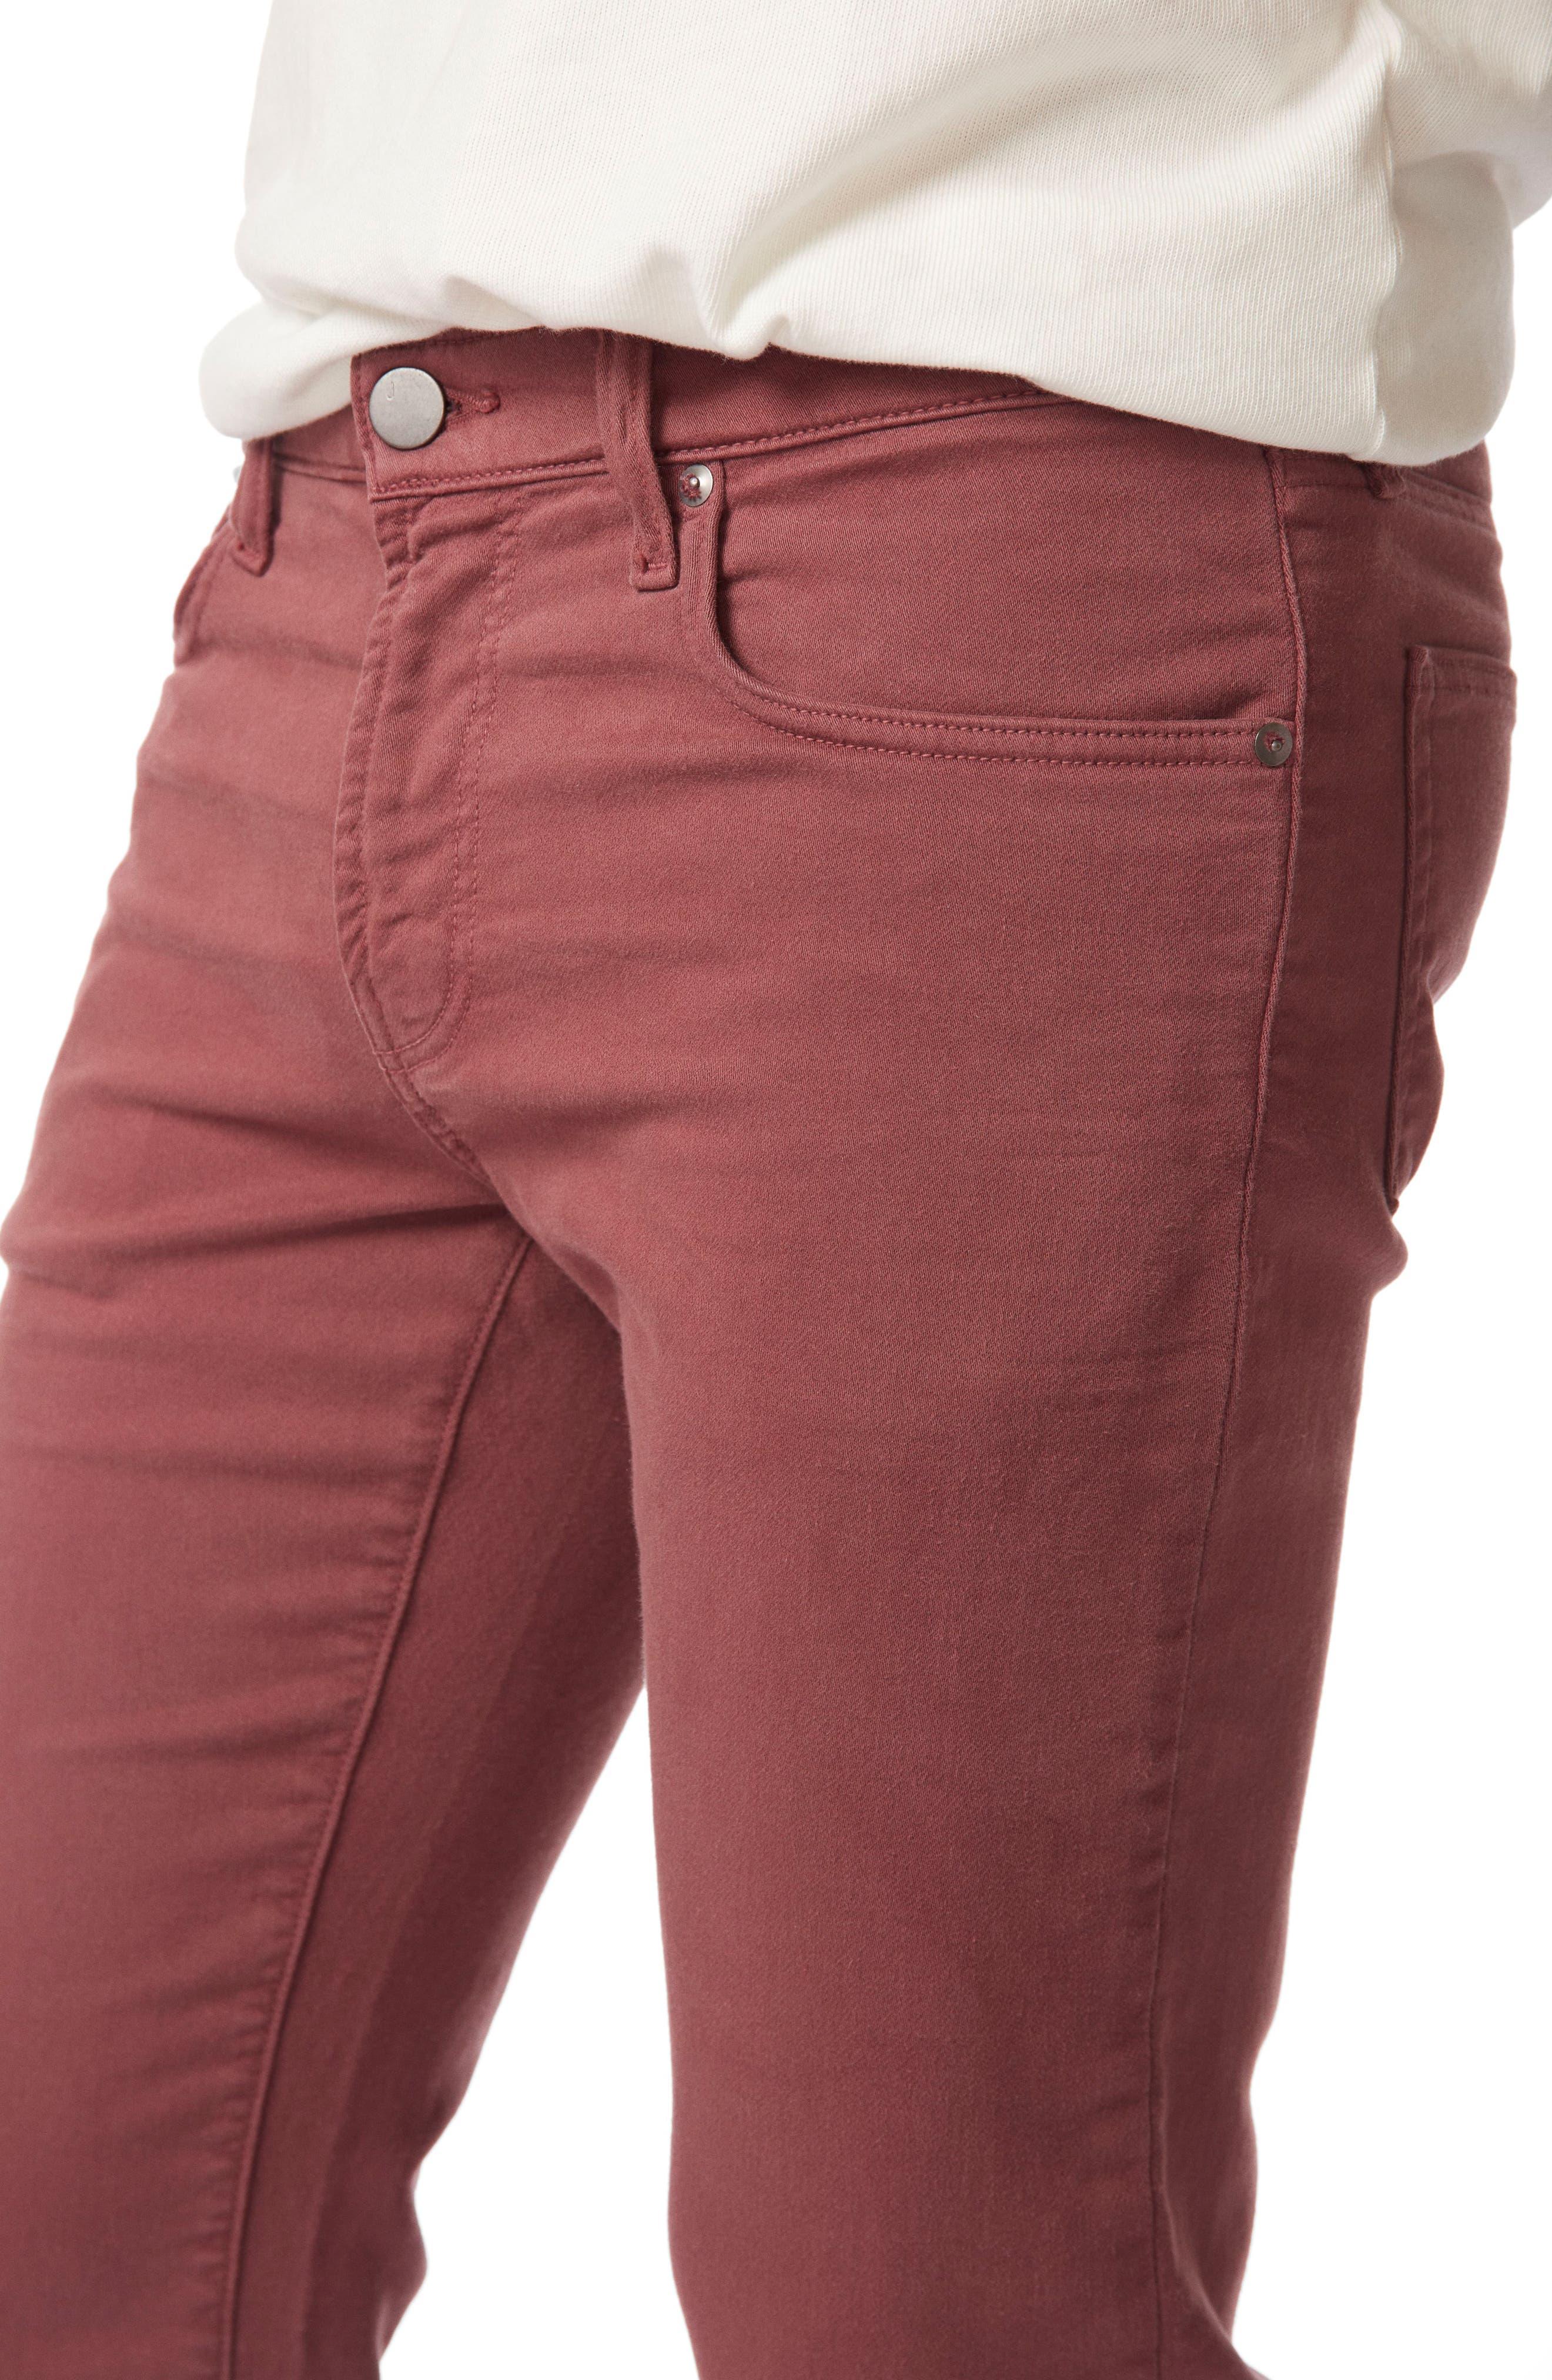 Kane Slim Straight Leg Pants,                             Alternate thumbnail 4, color,                             019